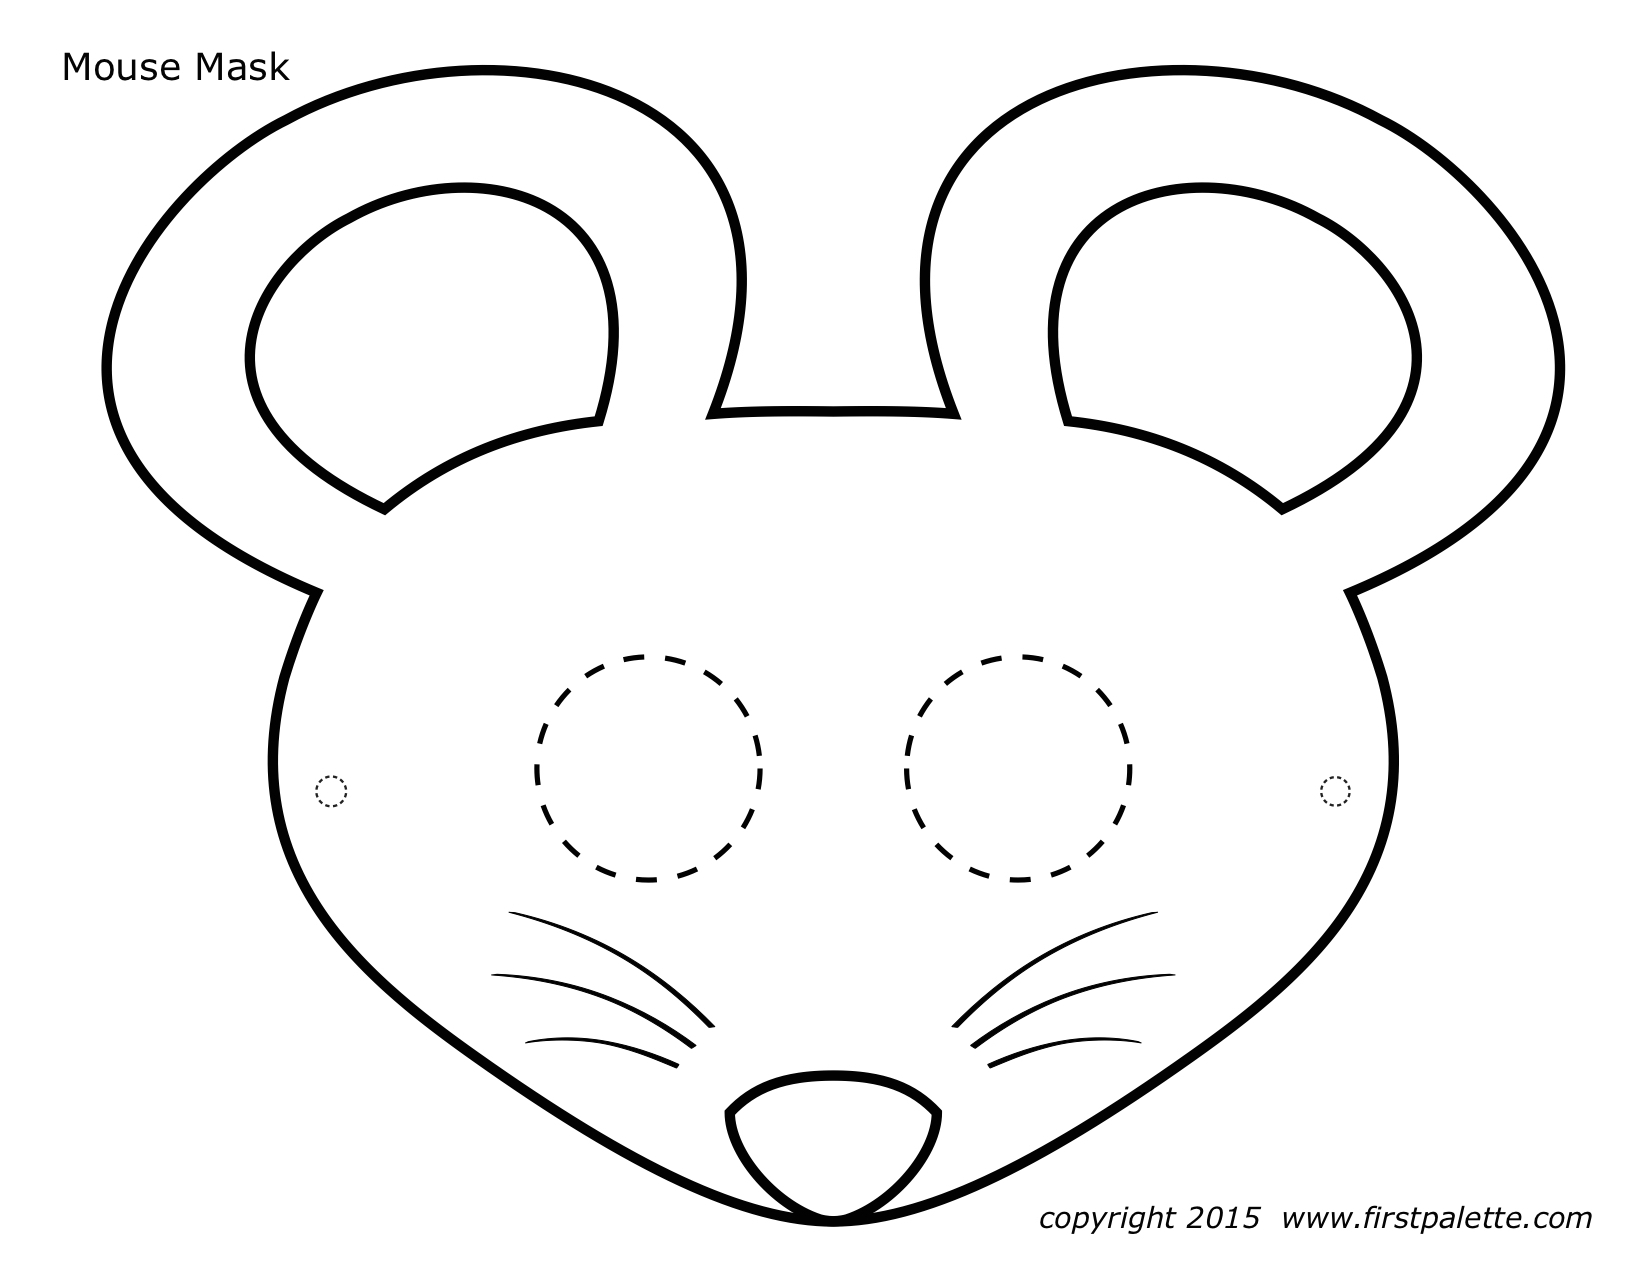 mousemask copy.jpg